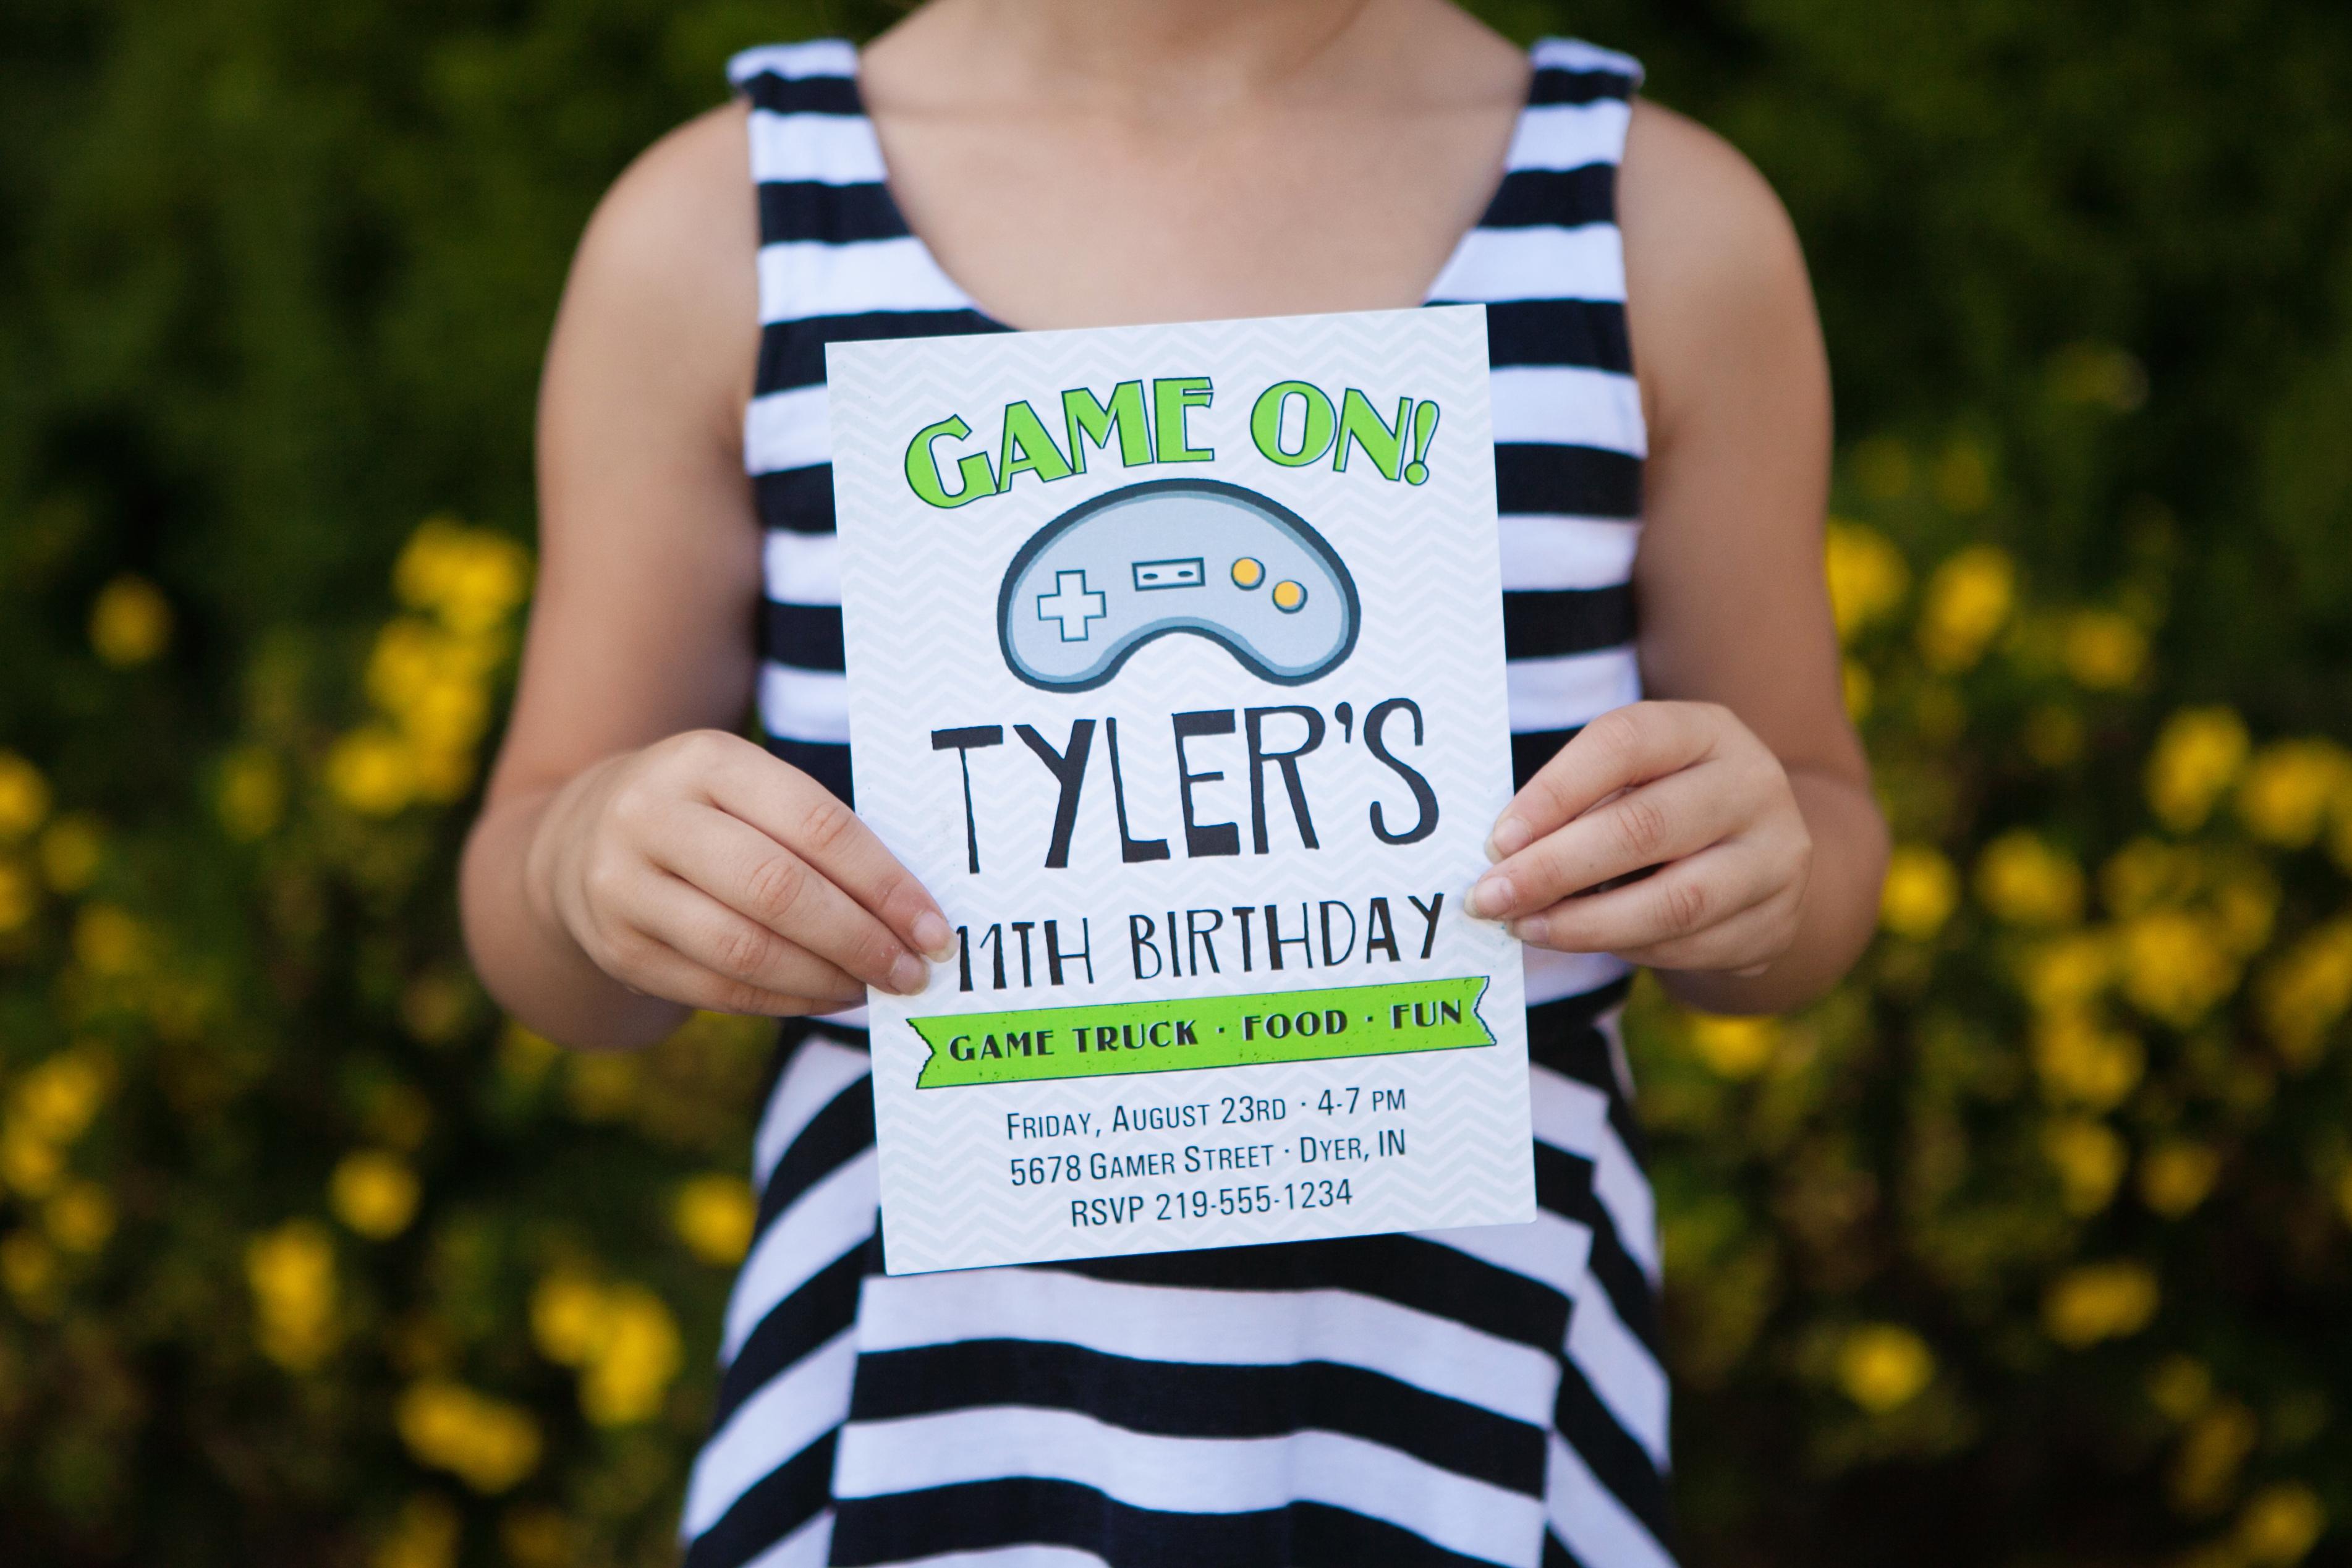 Video Game Truck Party Printable Invitation | The Homespun Hostess